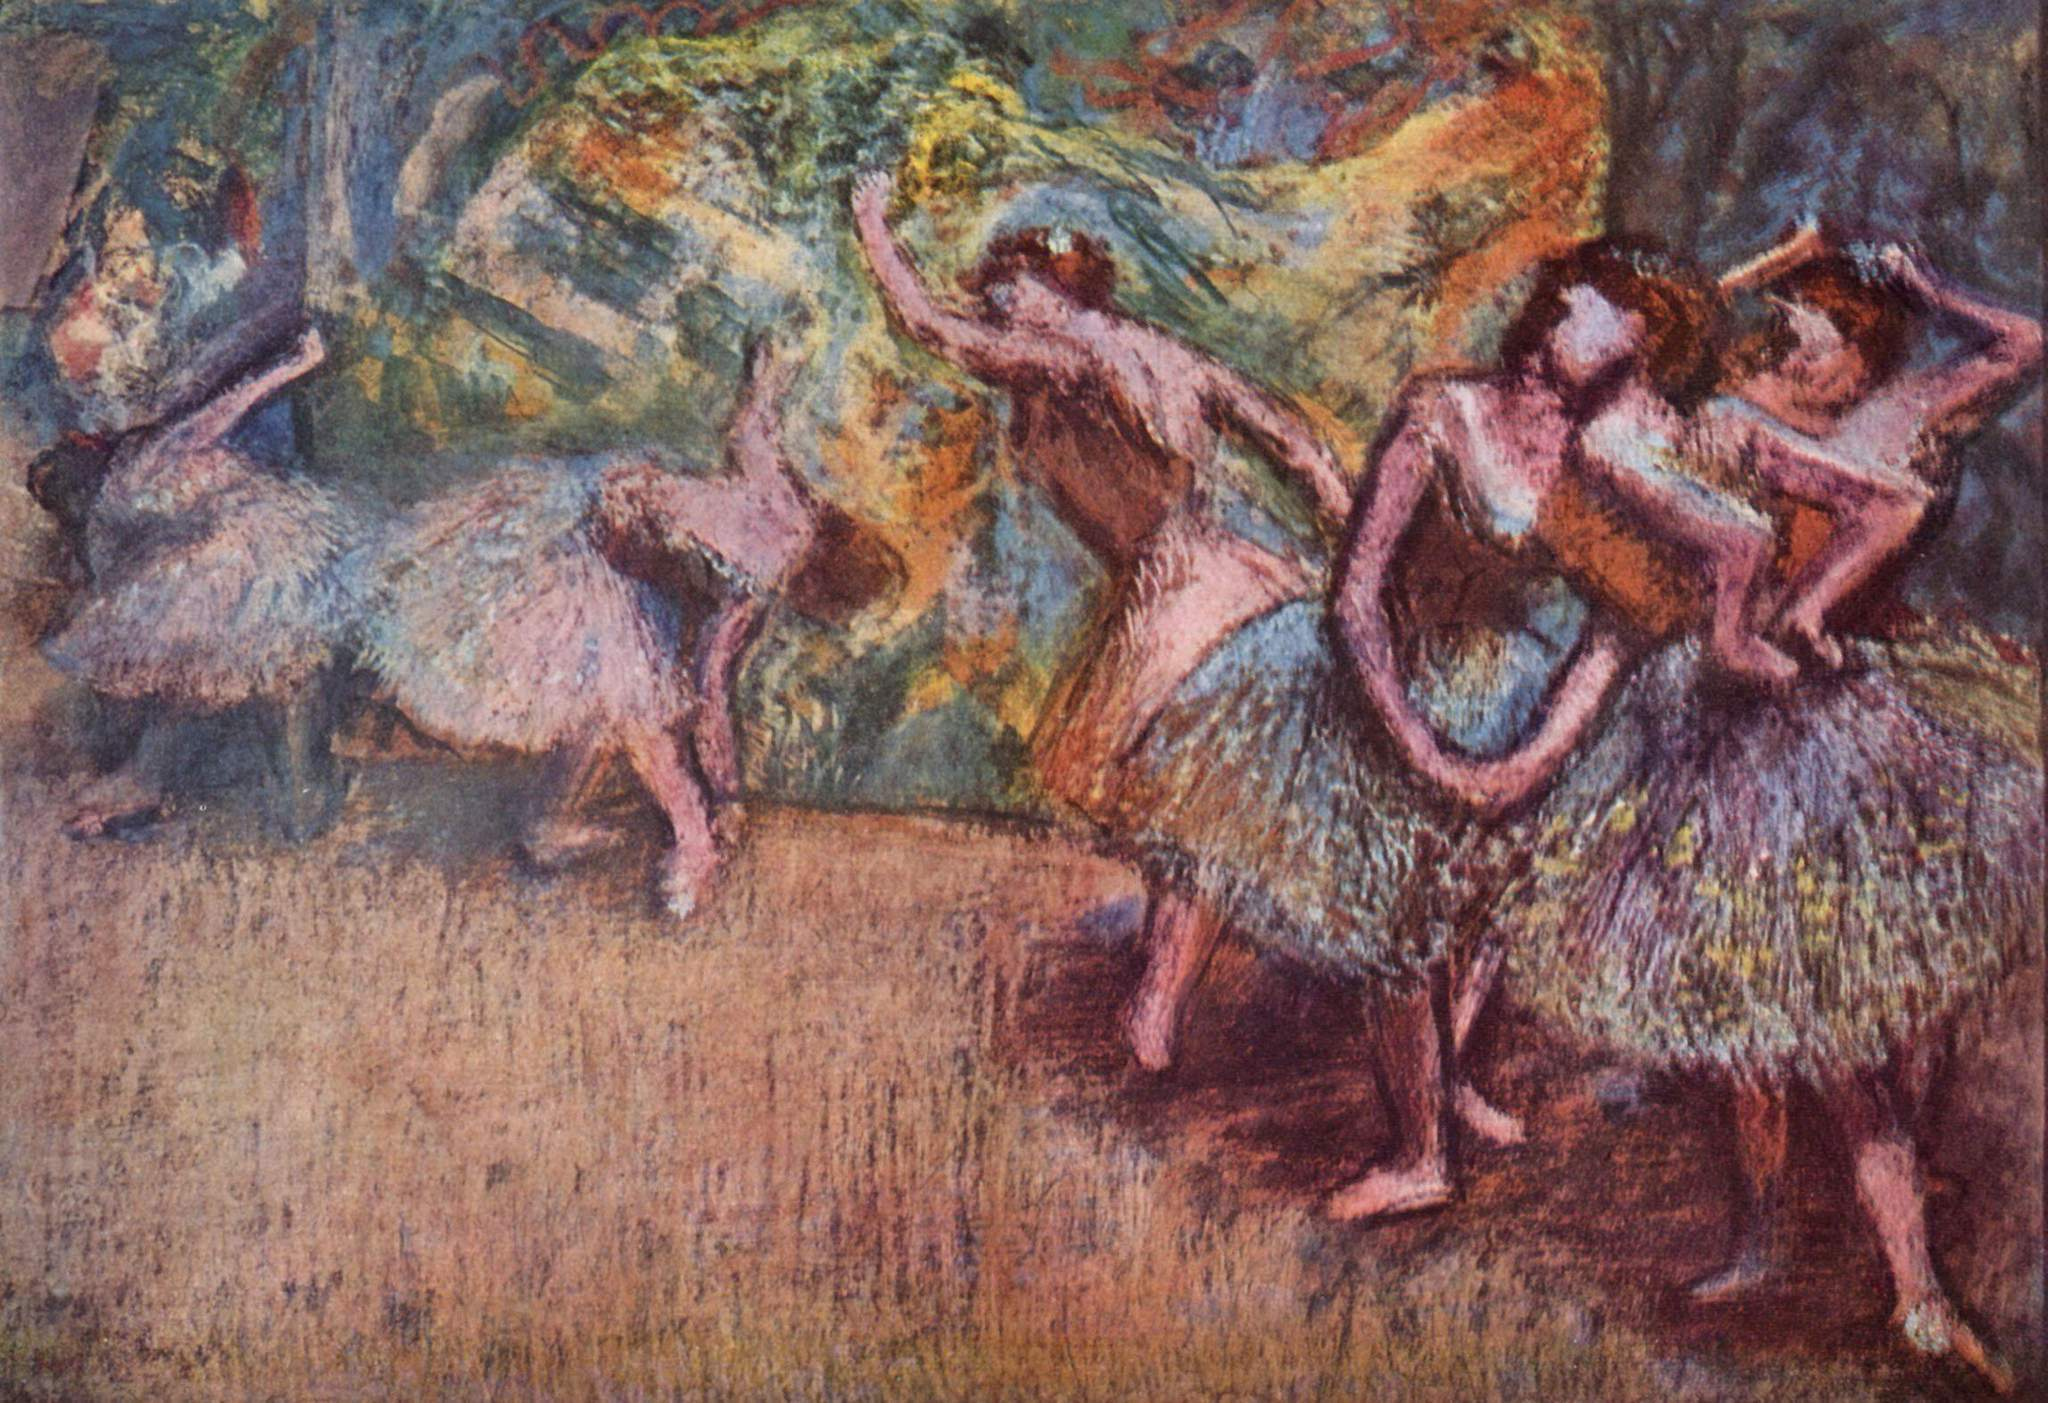 File:Edgar Germain Hilaire Degas 024.jpg - Wikimedia Commons